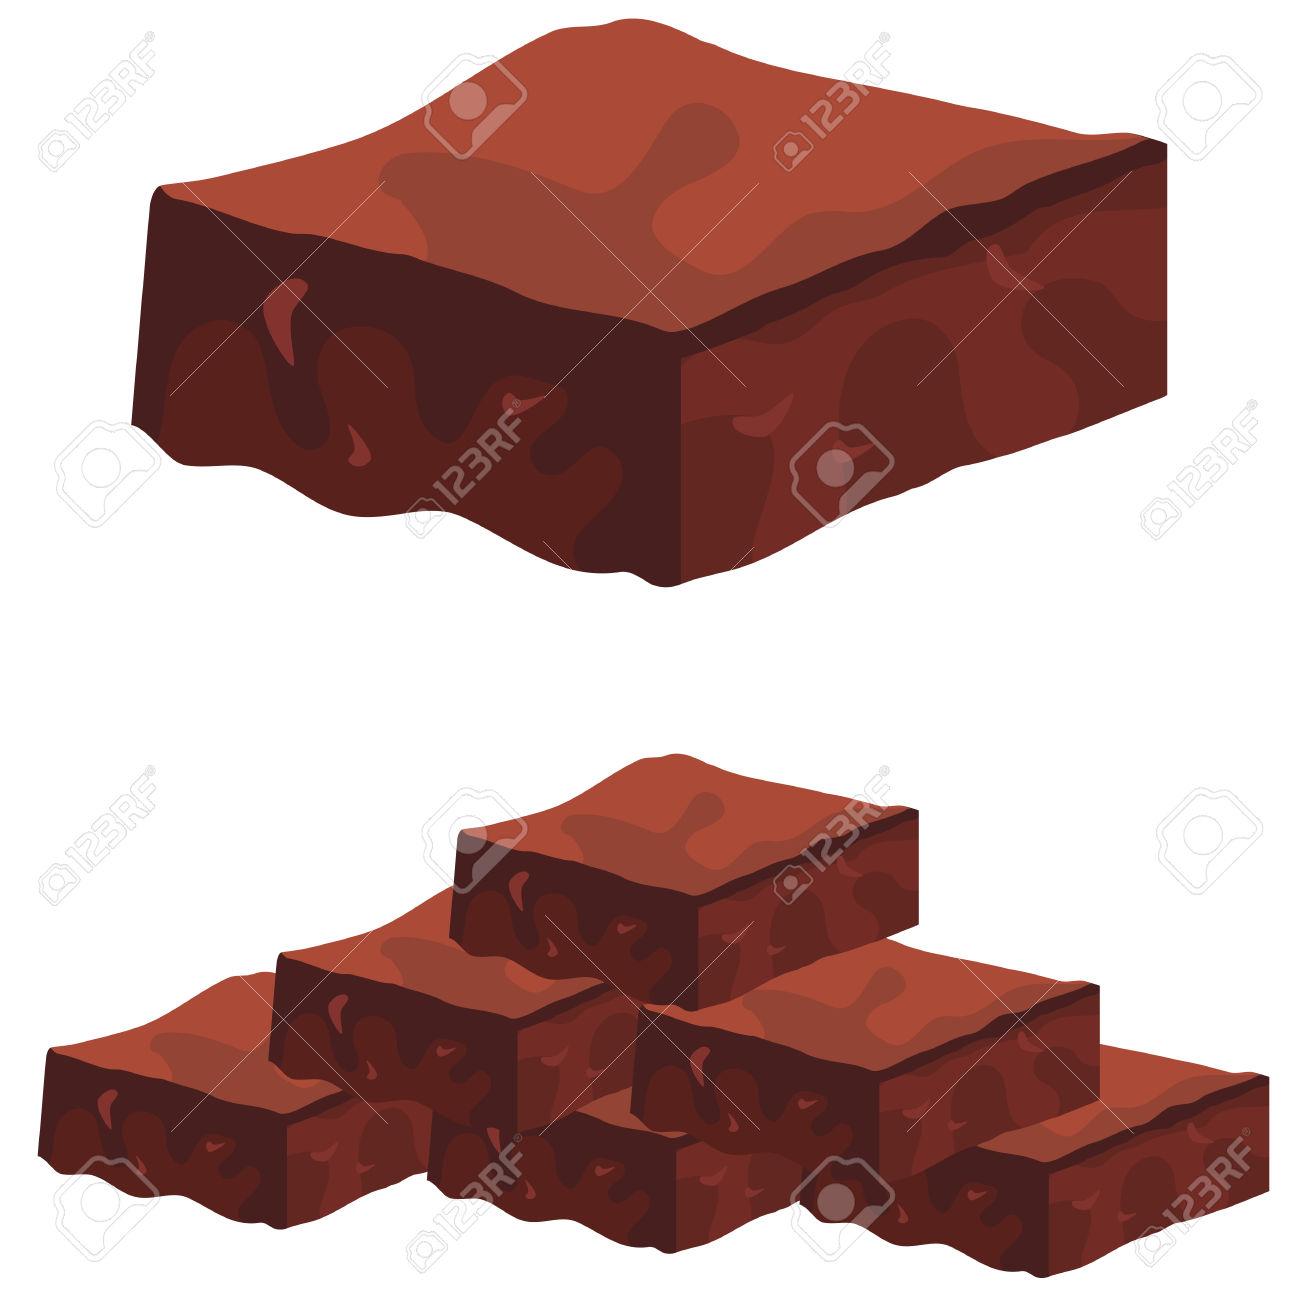 1300x1300 Brownie Clipart Chocolate Brownie